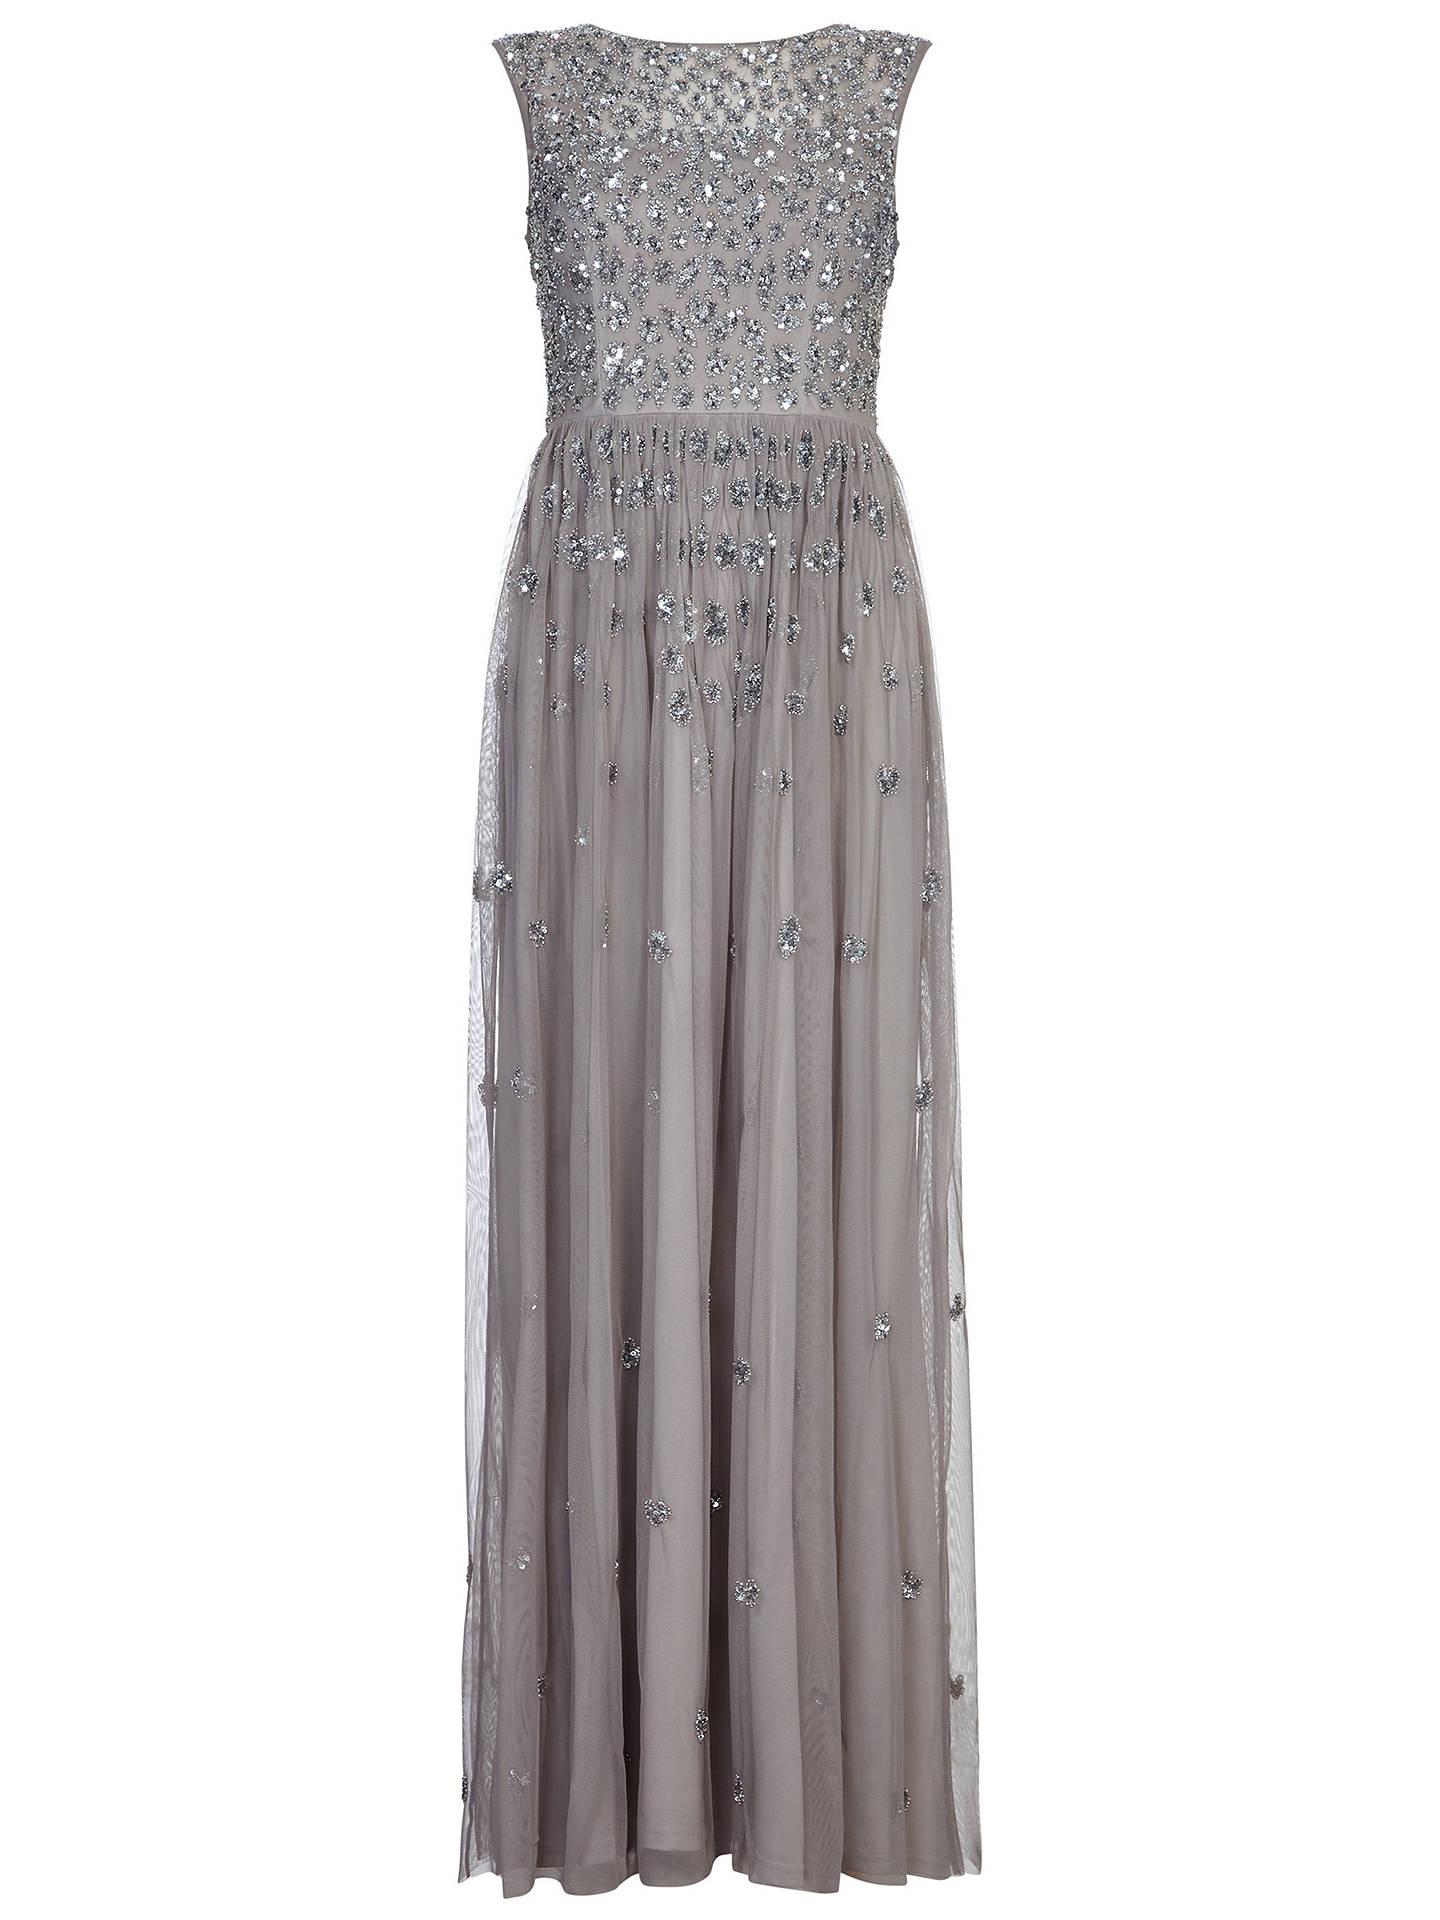 c528af8efb2e ... Buy Adrianna Papell Bead Mesh Long Dress